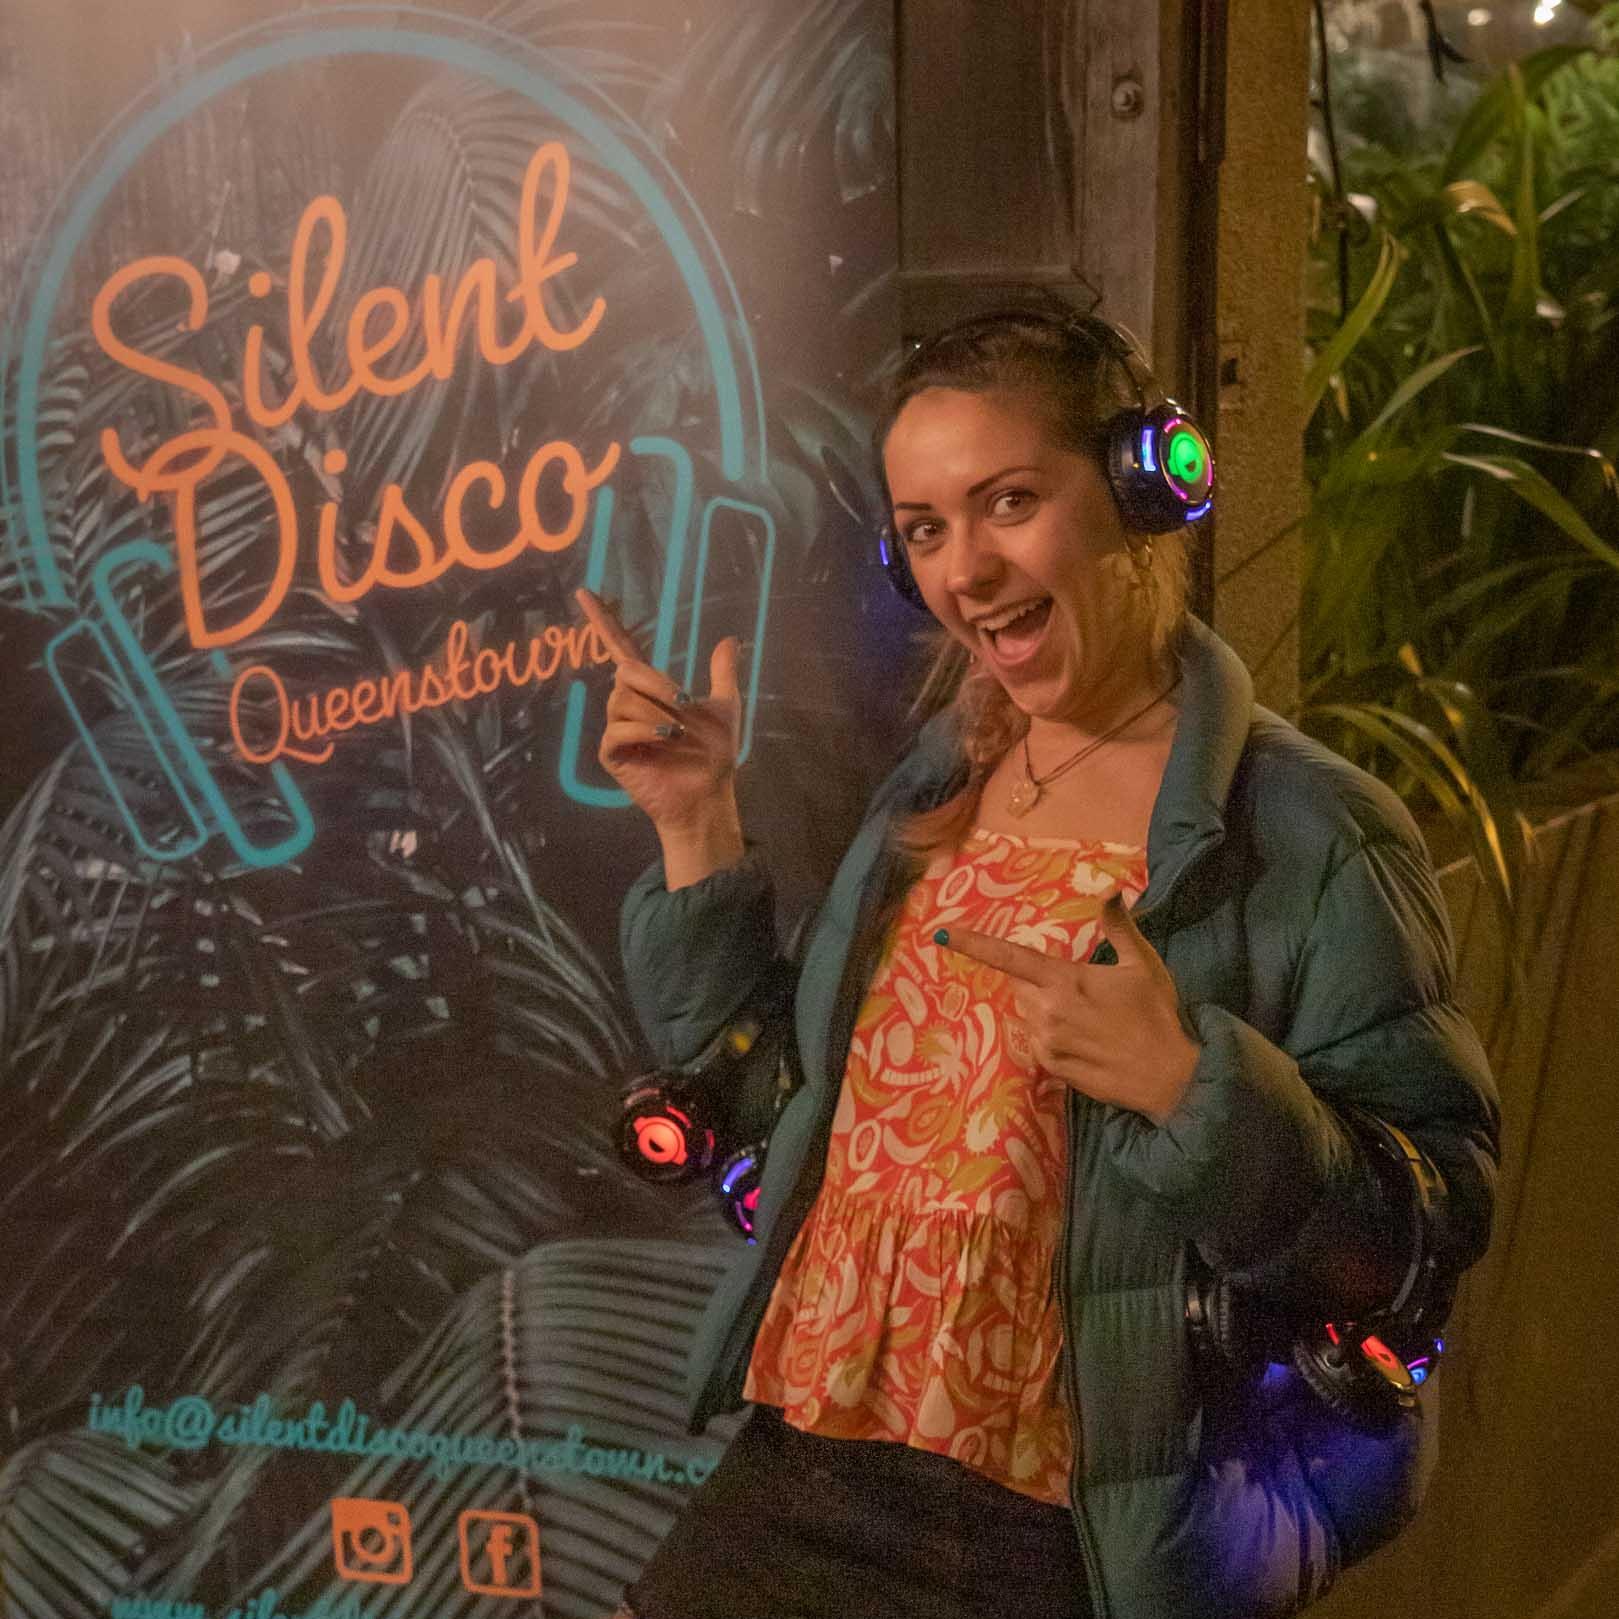 Silent Disco_6350.jpg